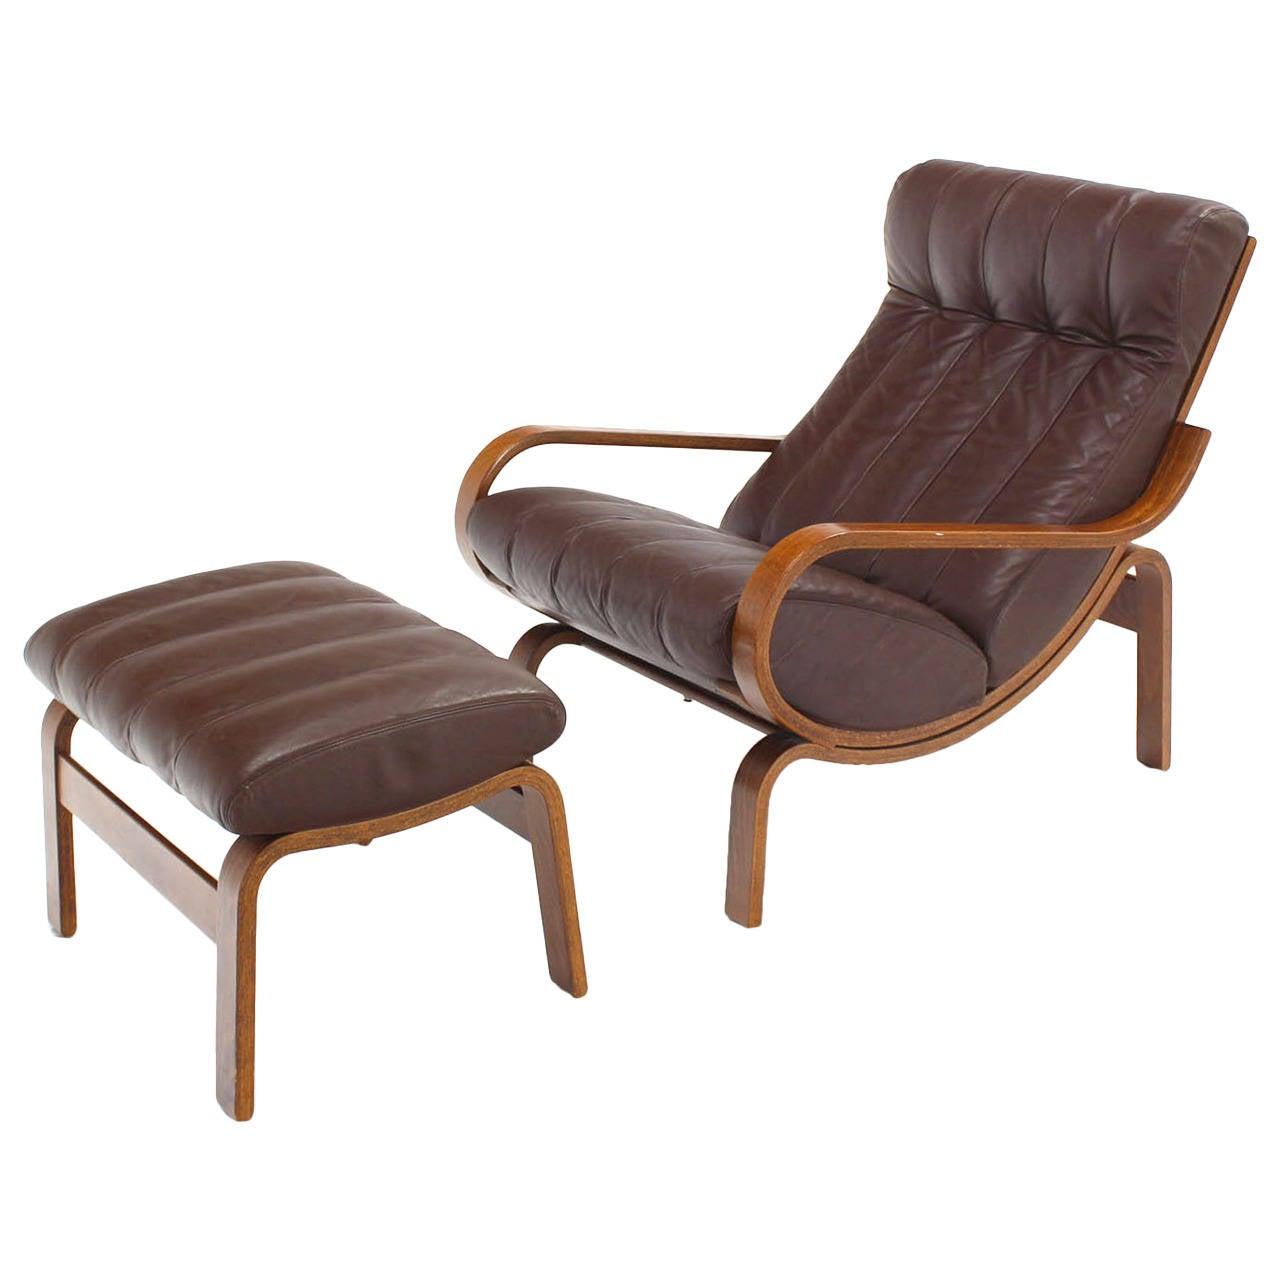 Danish Modern Adjustable Lounge Chair with Ottoman at 1stdibs